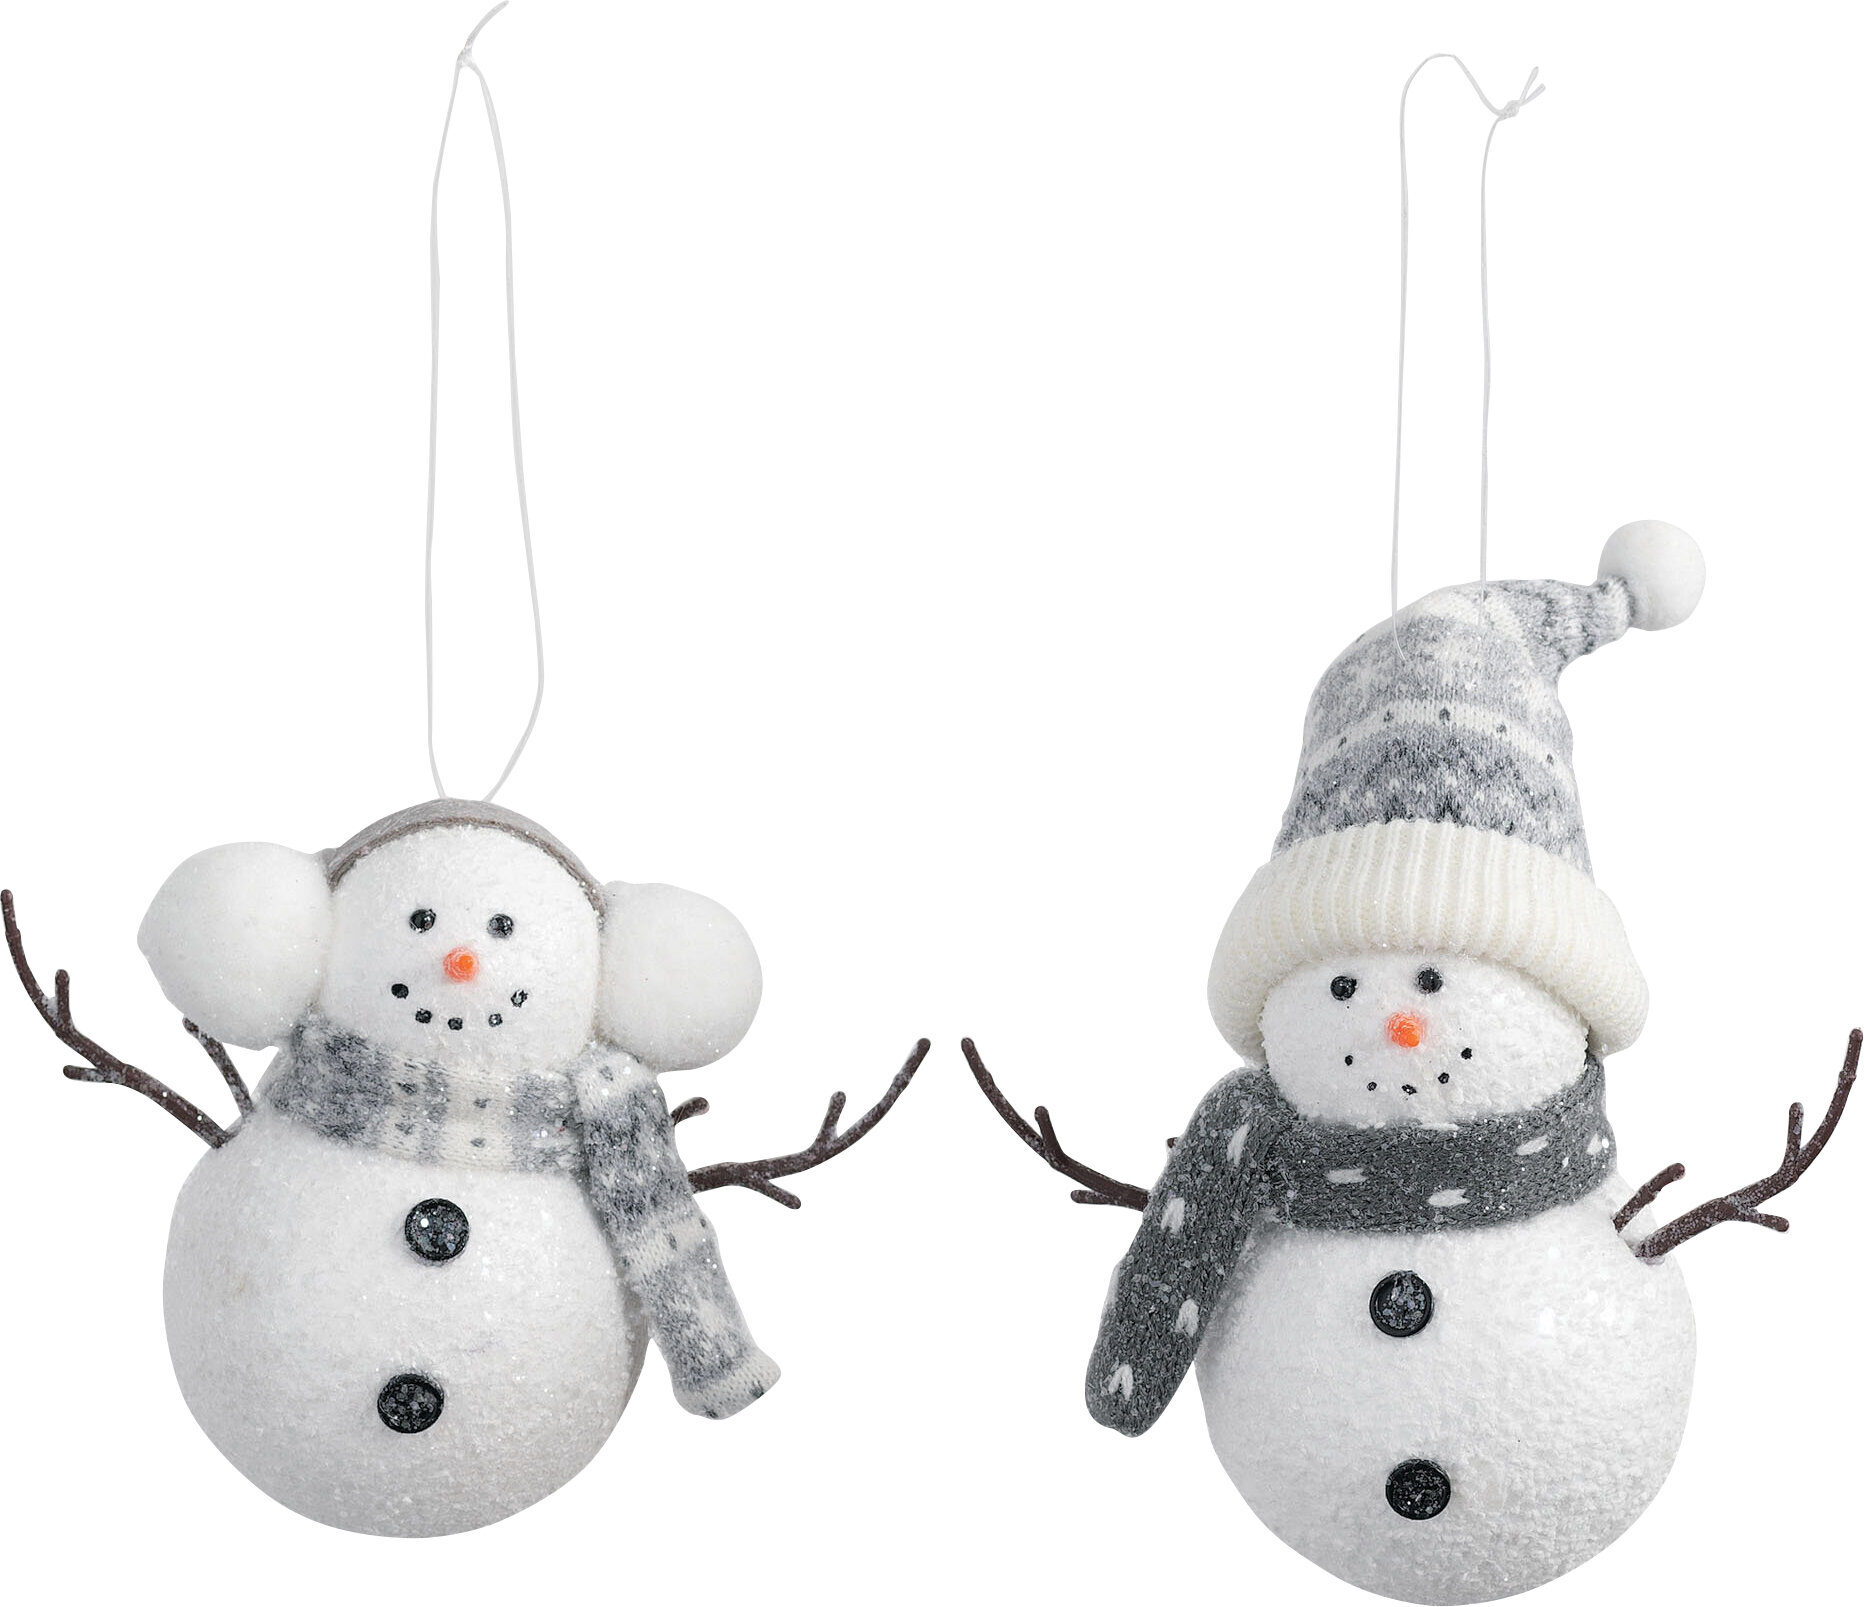 2 Piece Cozy Snowman Holiday Shaped Ornament Set Birch Lane